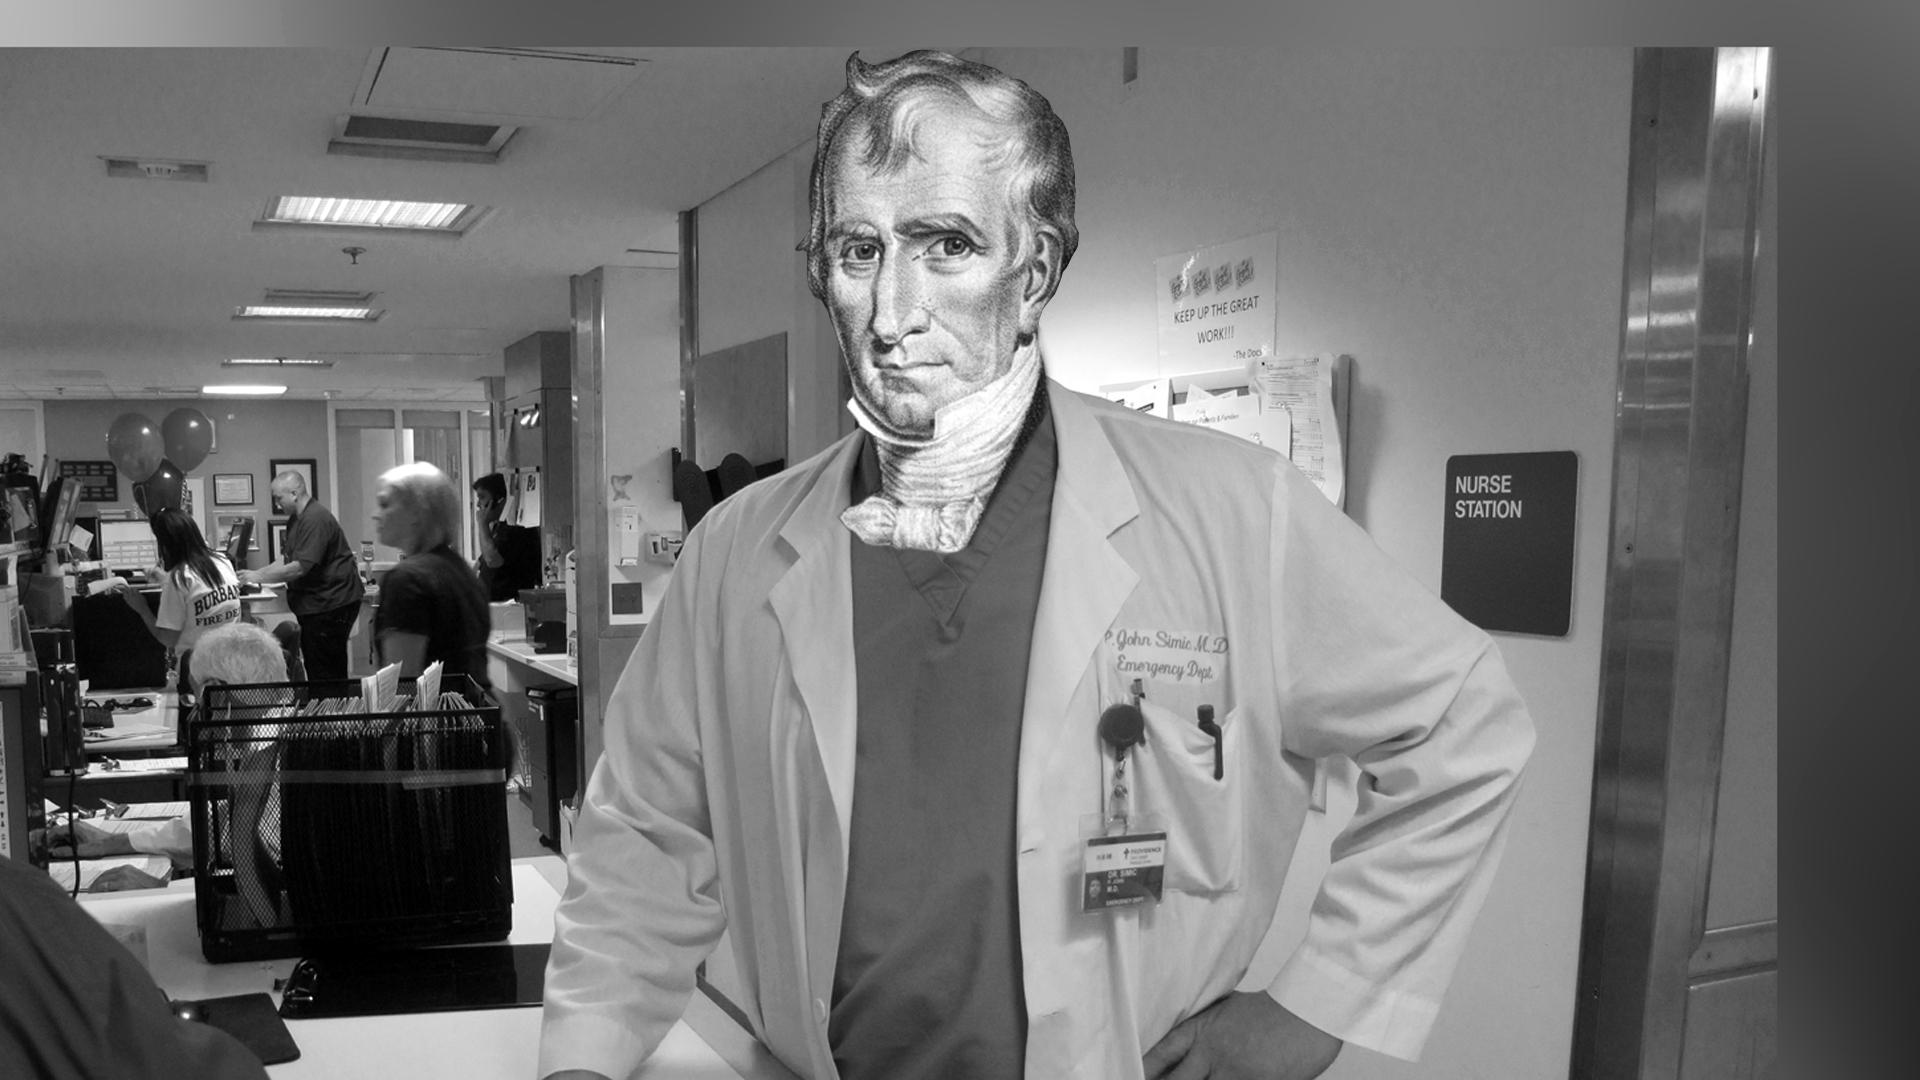 SOTU_HARRISON_doctor